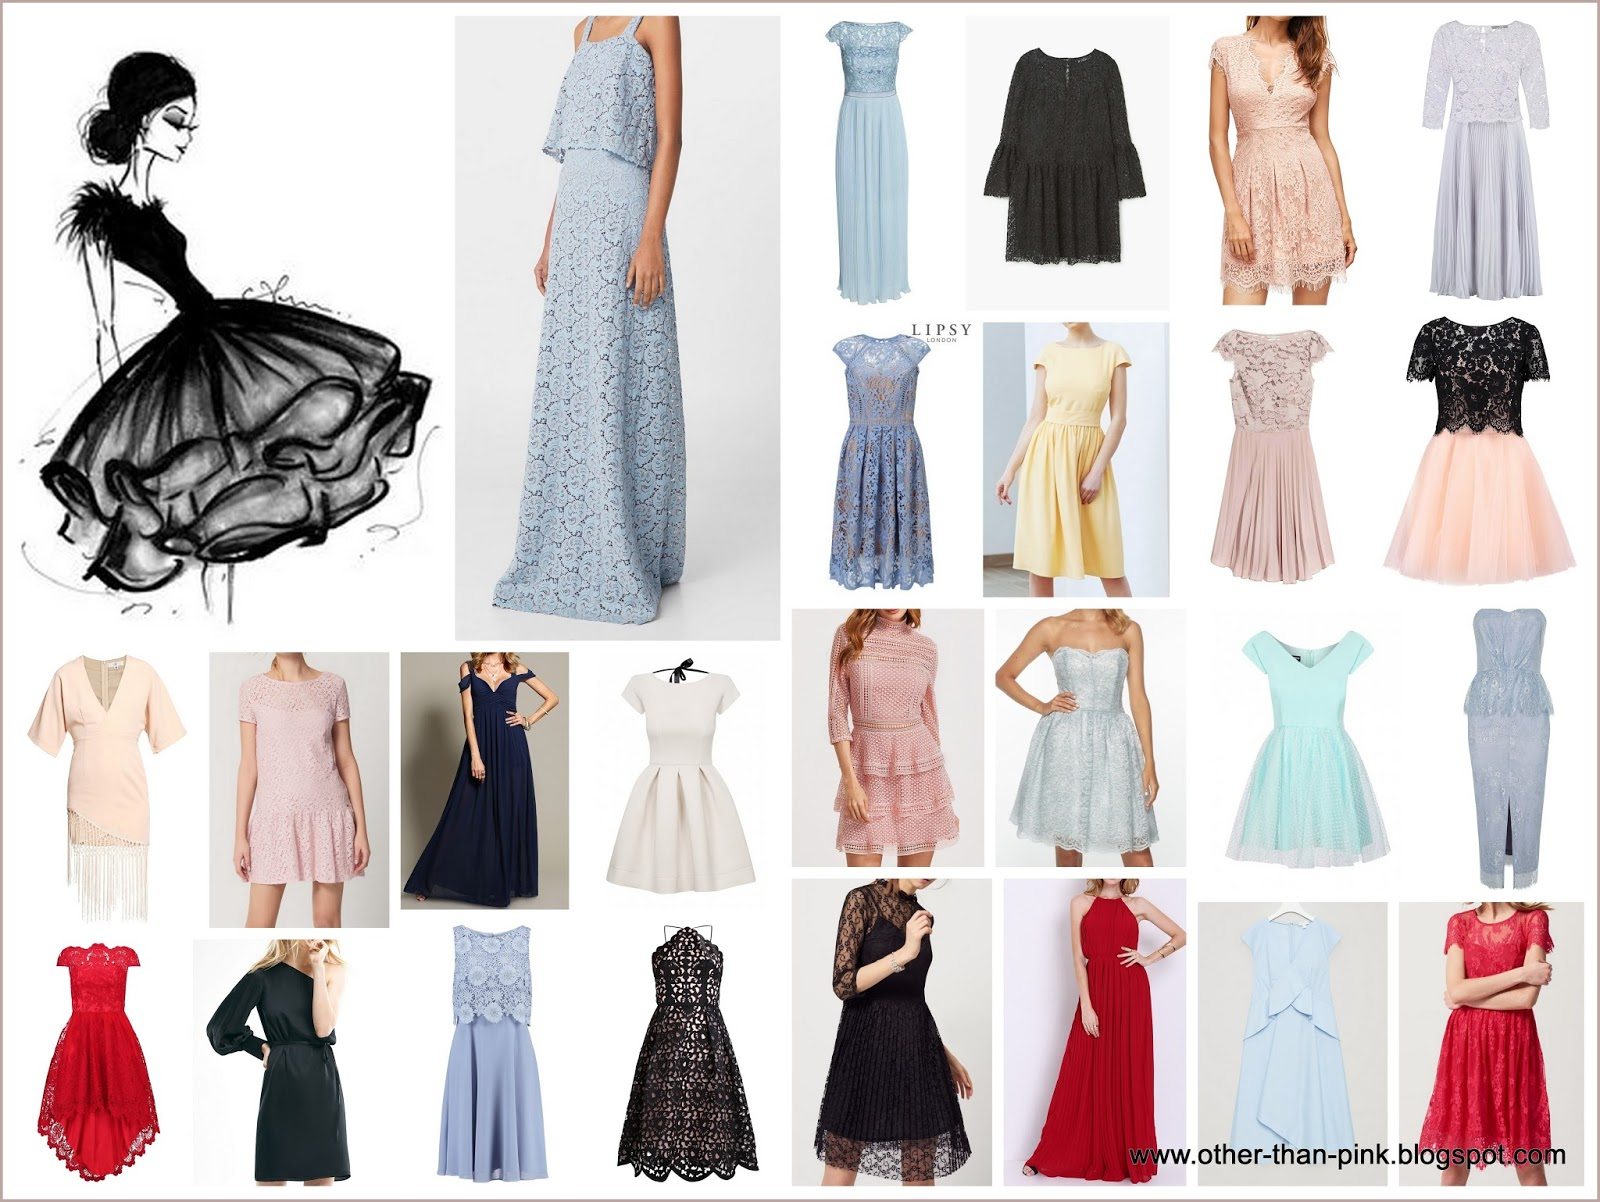 The wedding party dress czyli sukienki na lub i wesele for What to wear to a wedding other than a dress